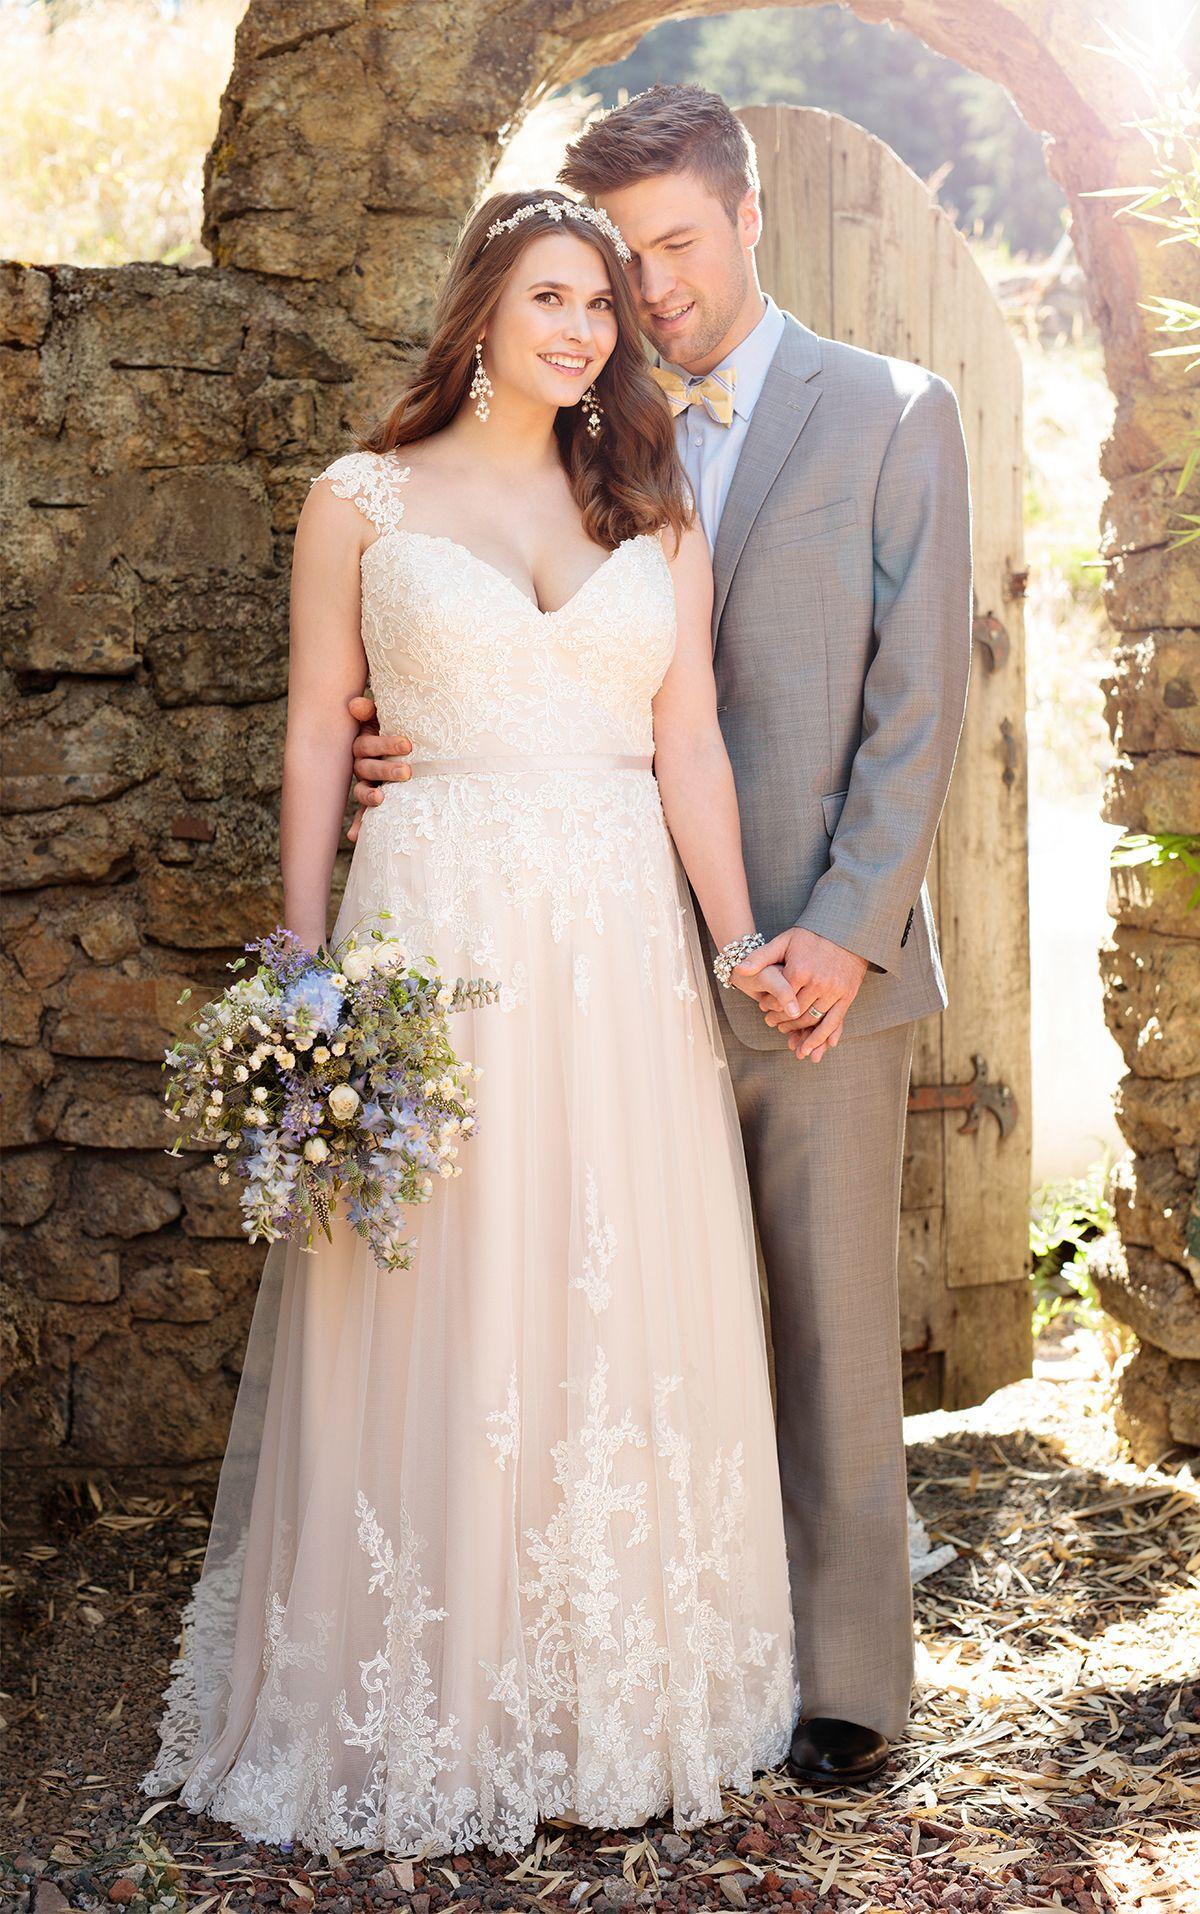 16e69c6f413 Essense of Australia s lace over matte-side Lustre satin A-line wedding gown  features sparkling beading